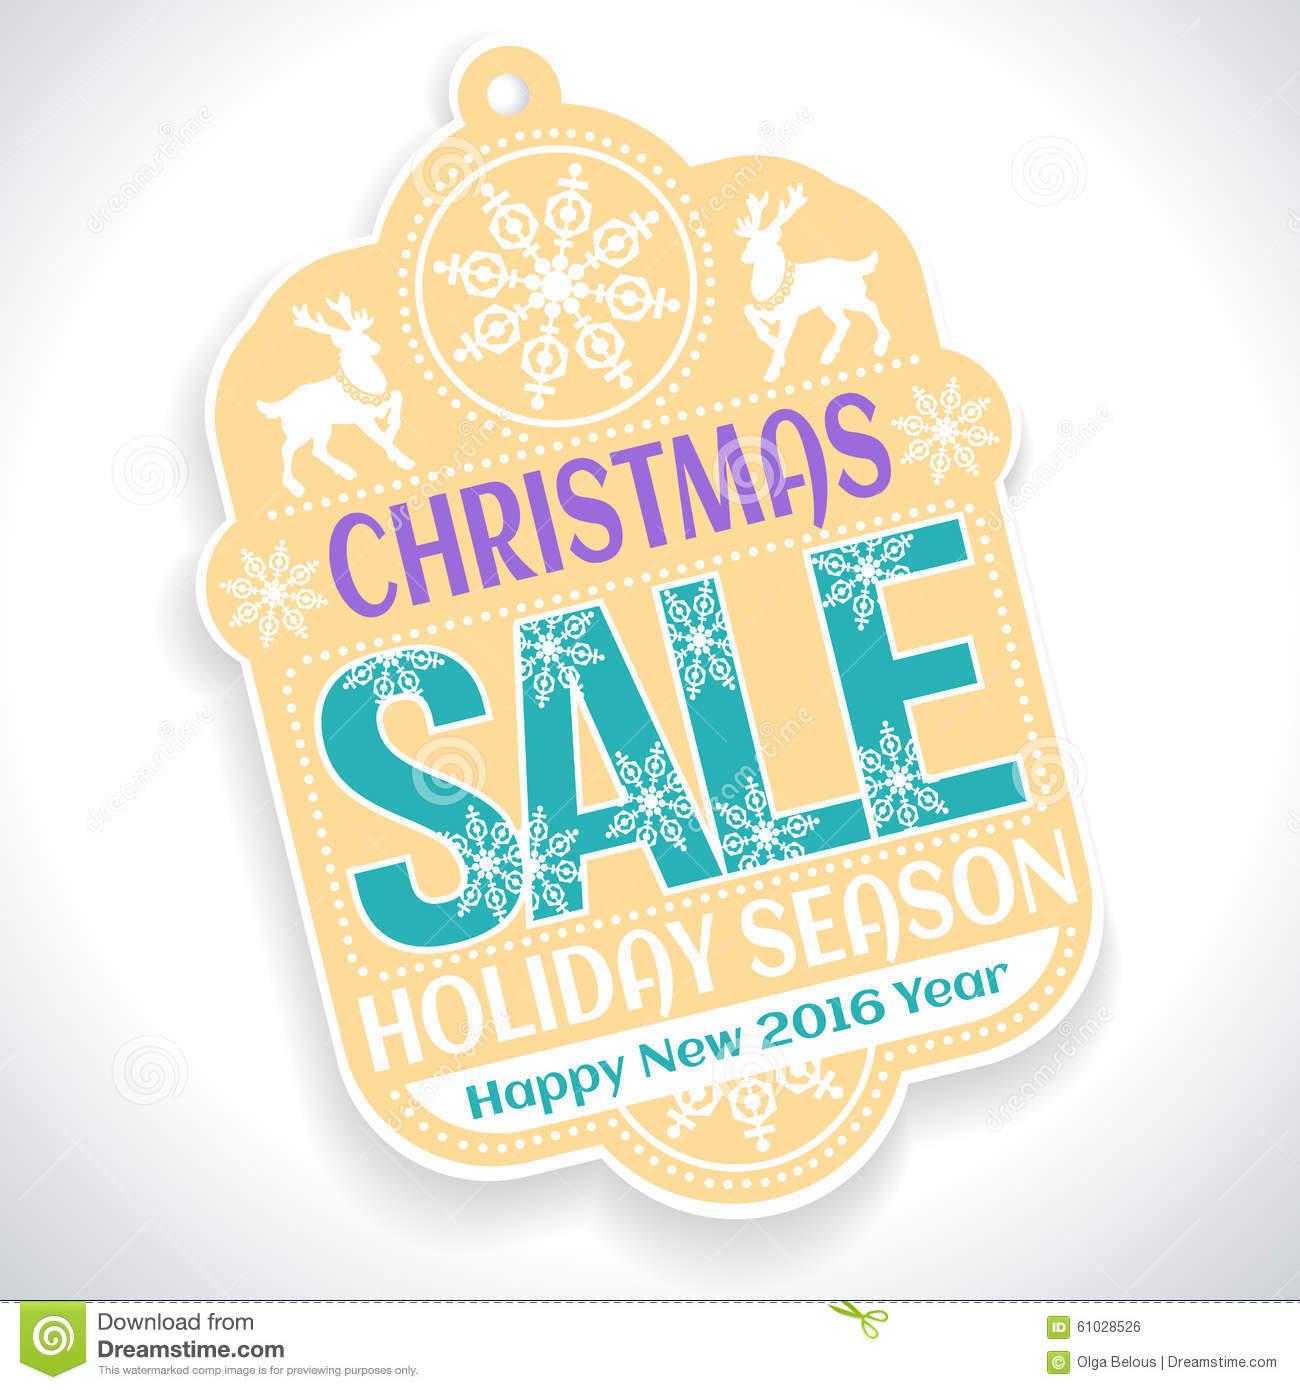 Christmas SALE Holiday Season And Happy New 2016 Stock Vector.